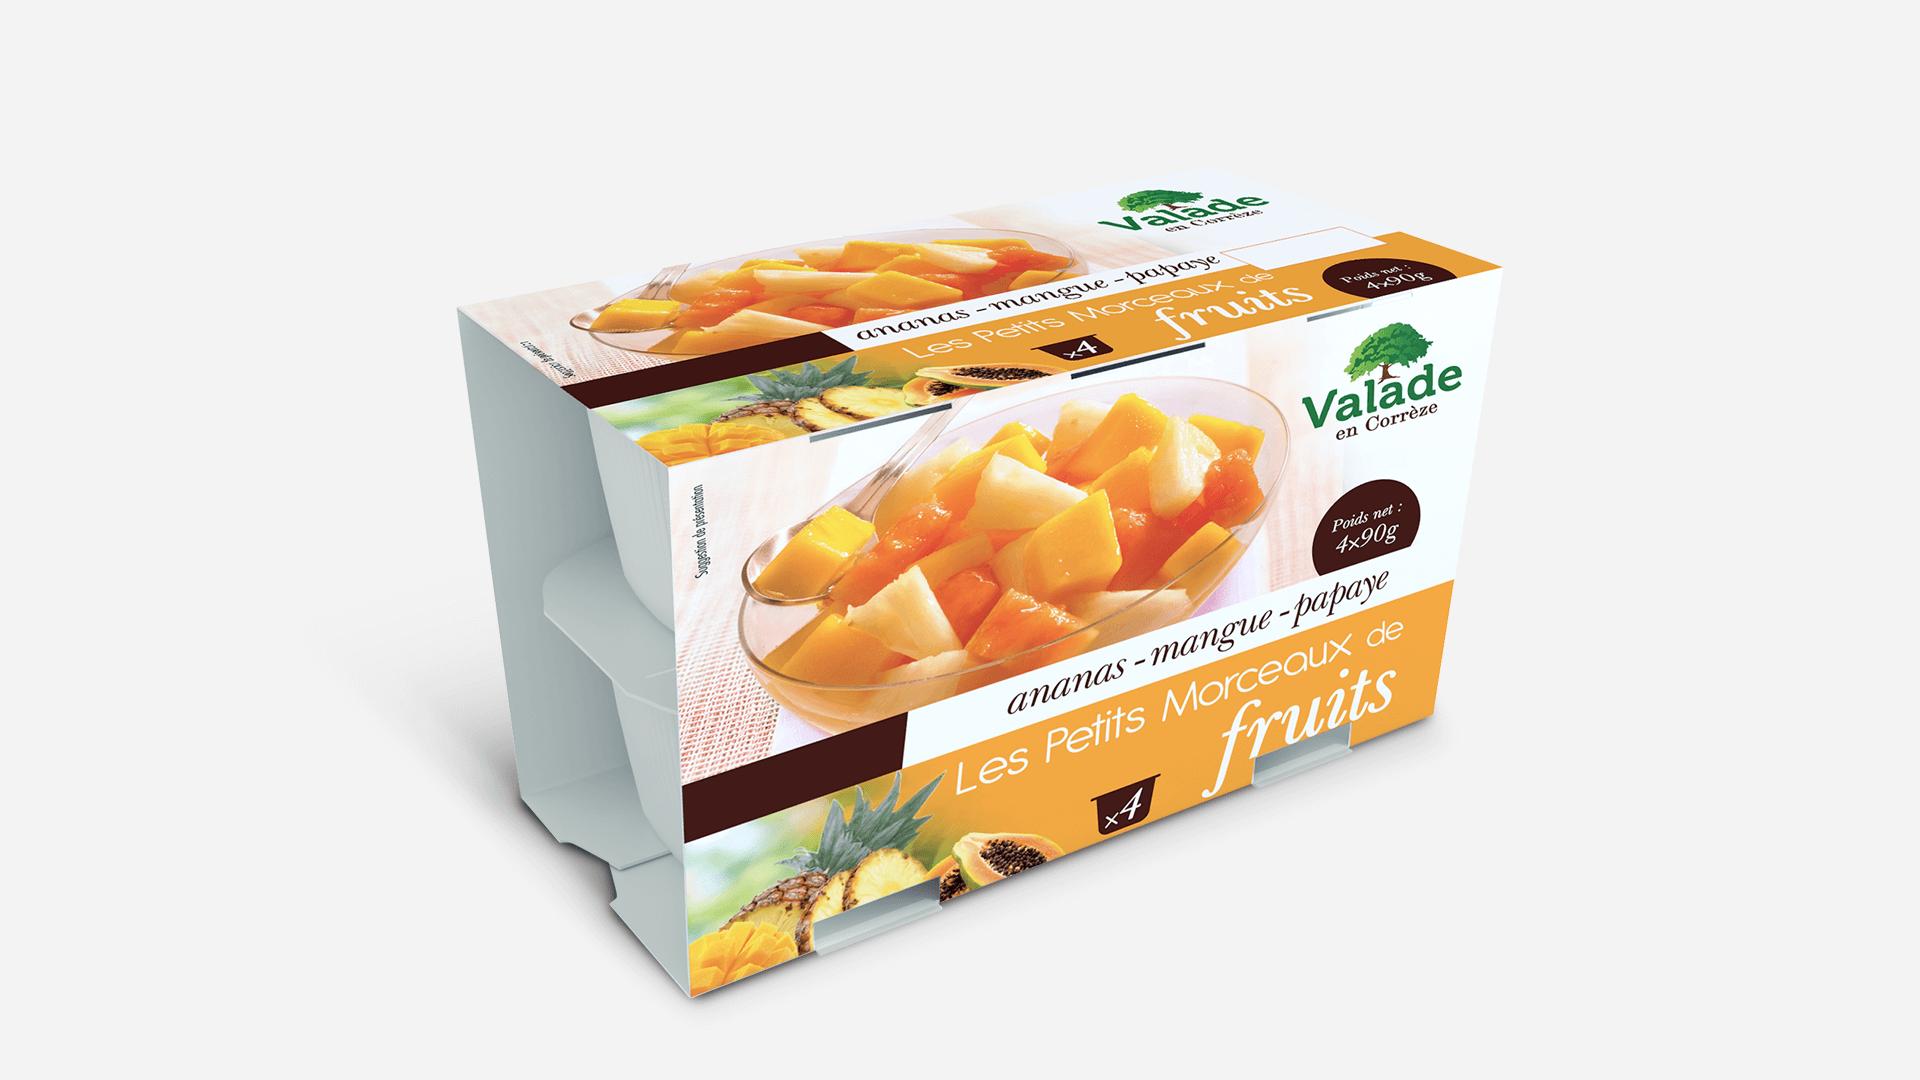 packaging fruit en morceaux Valade en Corrèze